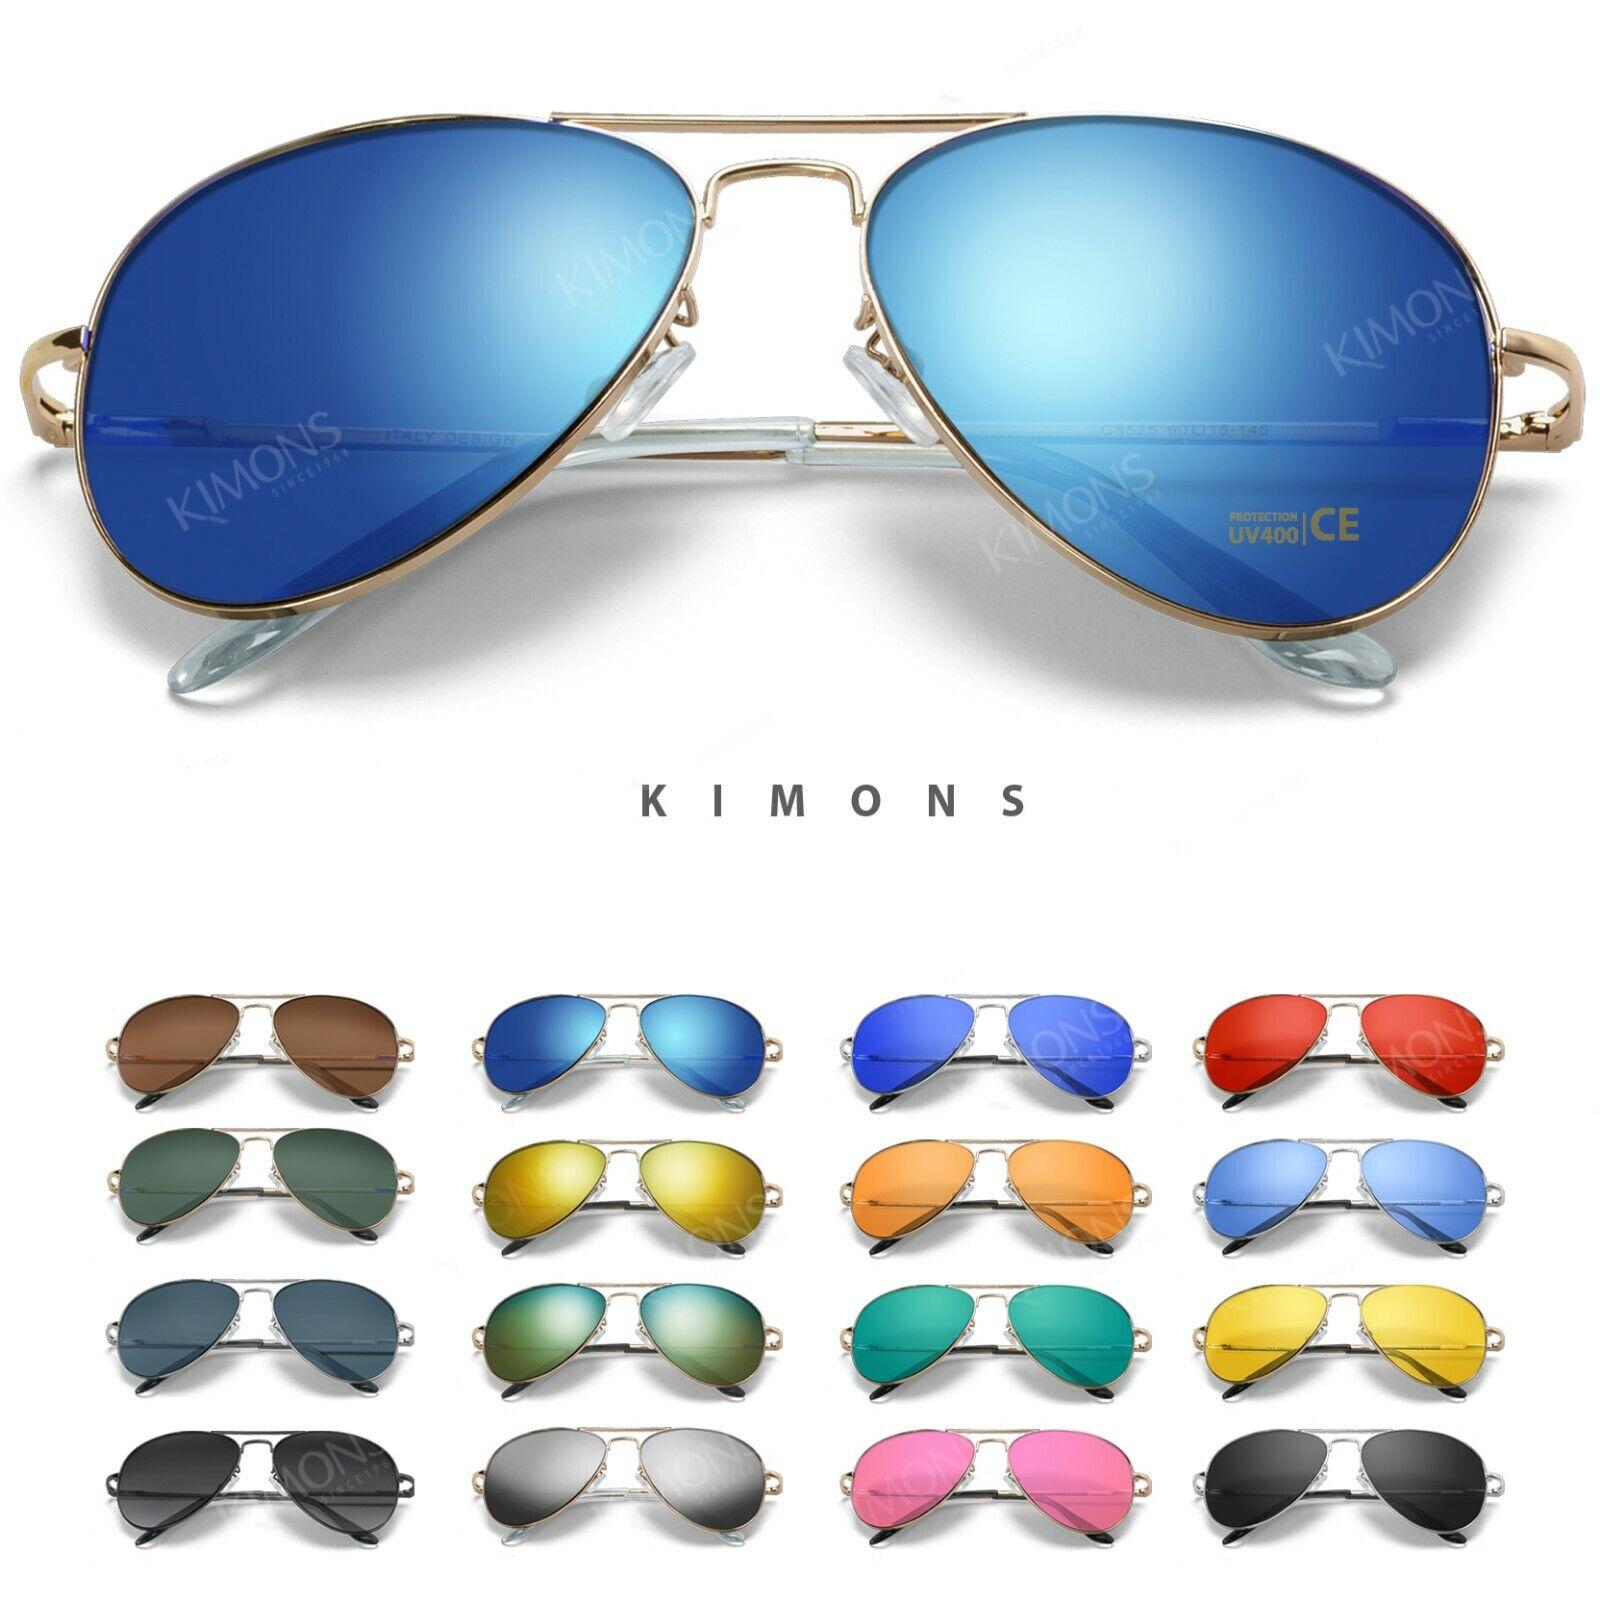 New Biohazard Rimless Retro Classic Round Men Women Sunglasses UV400 Free Pouch